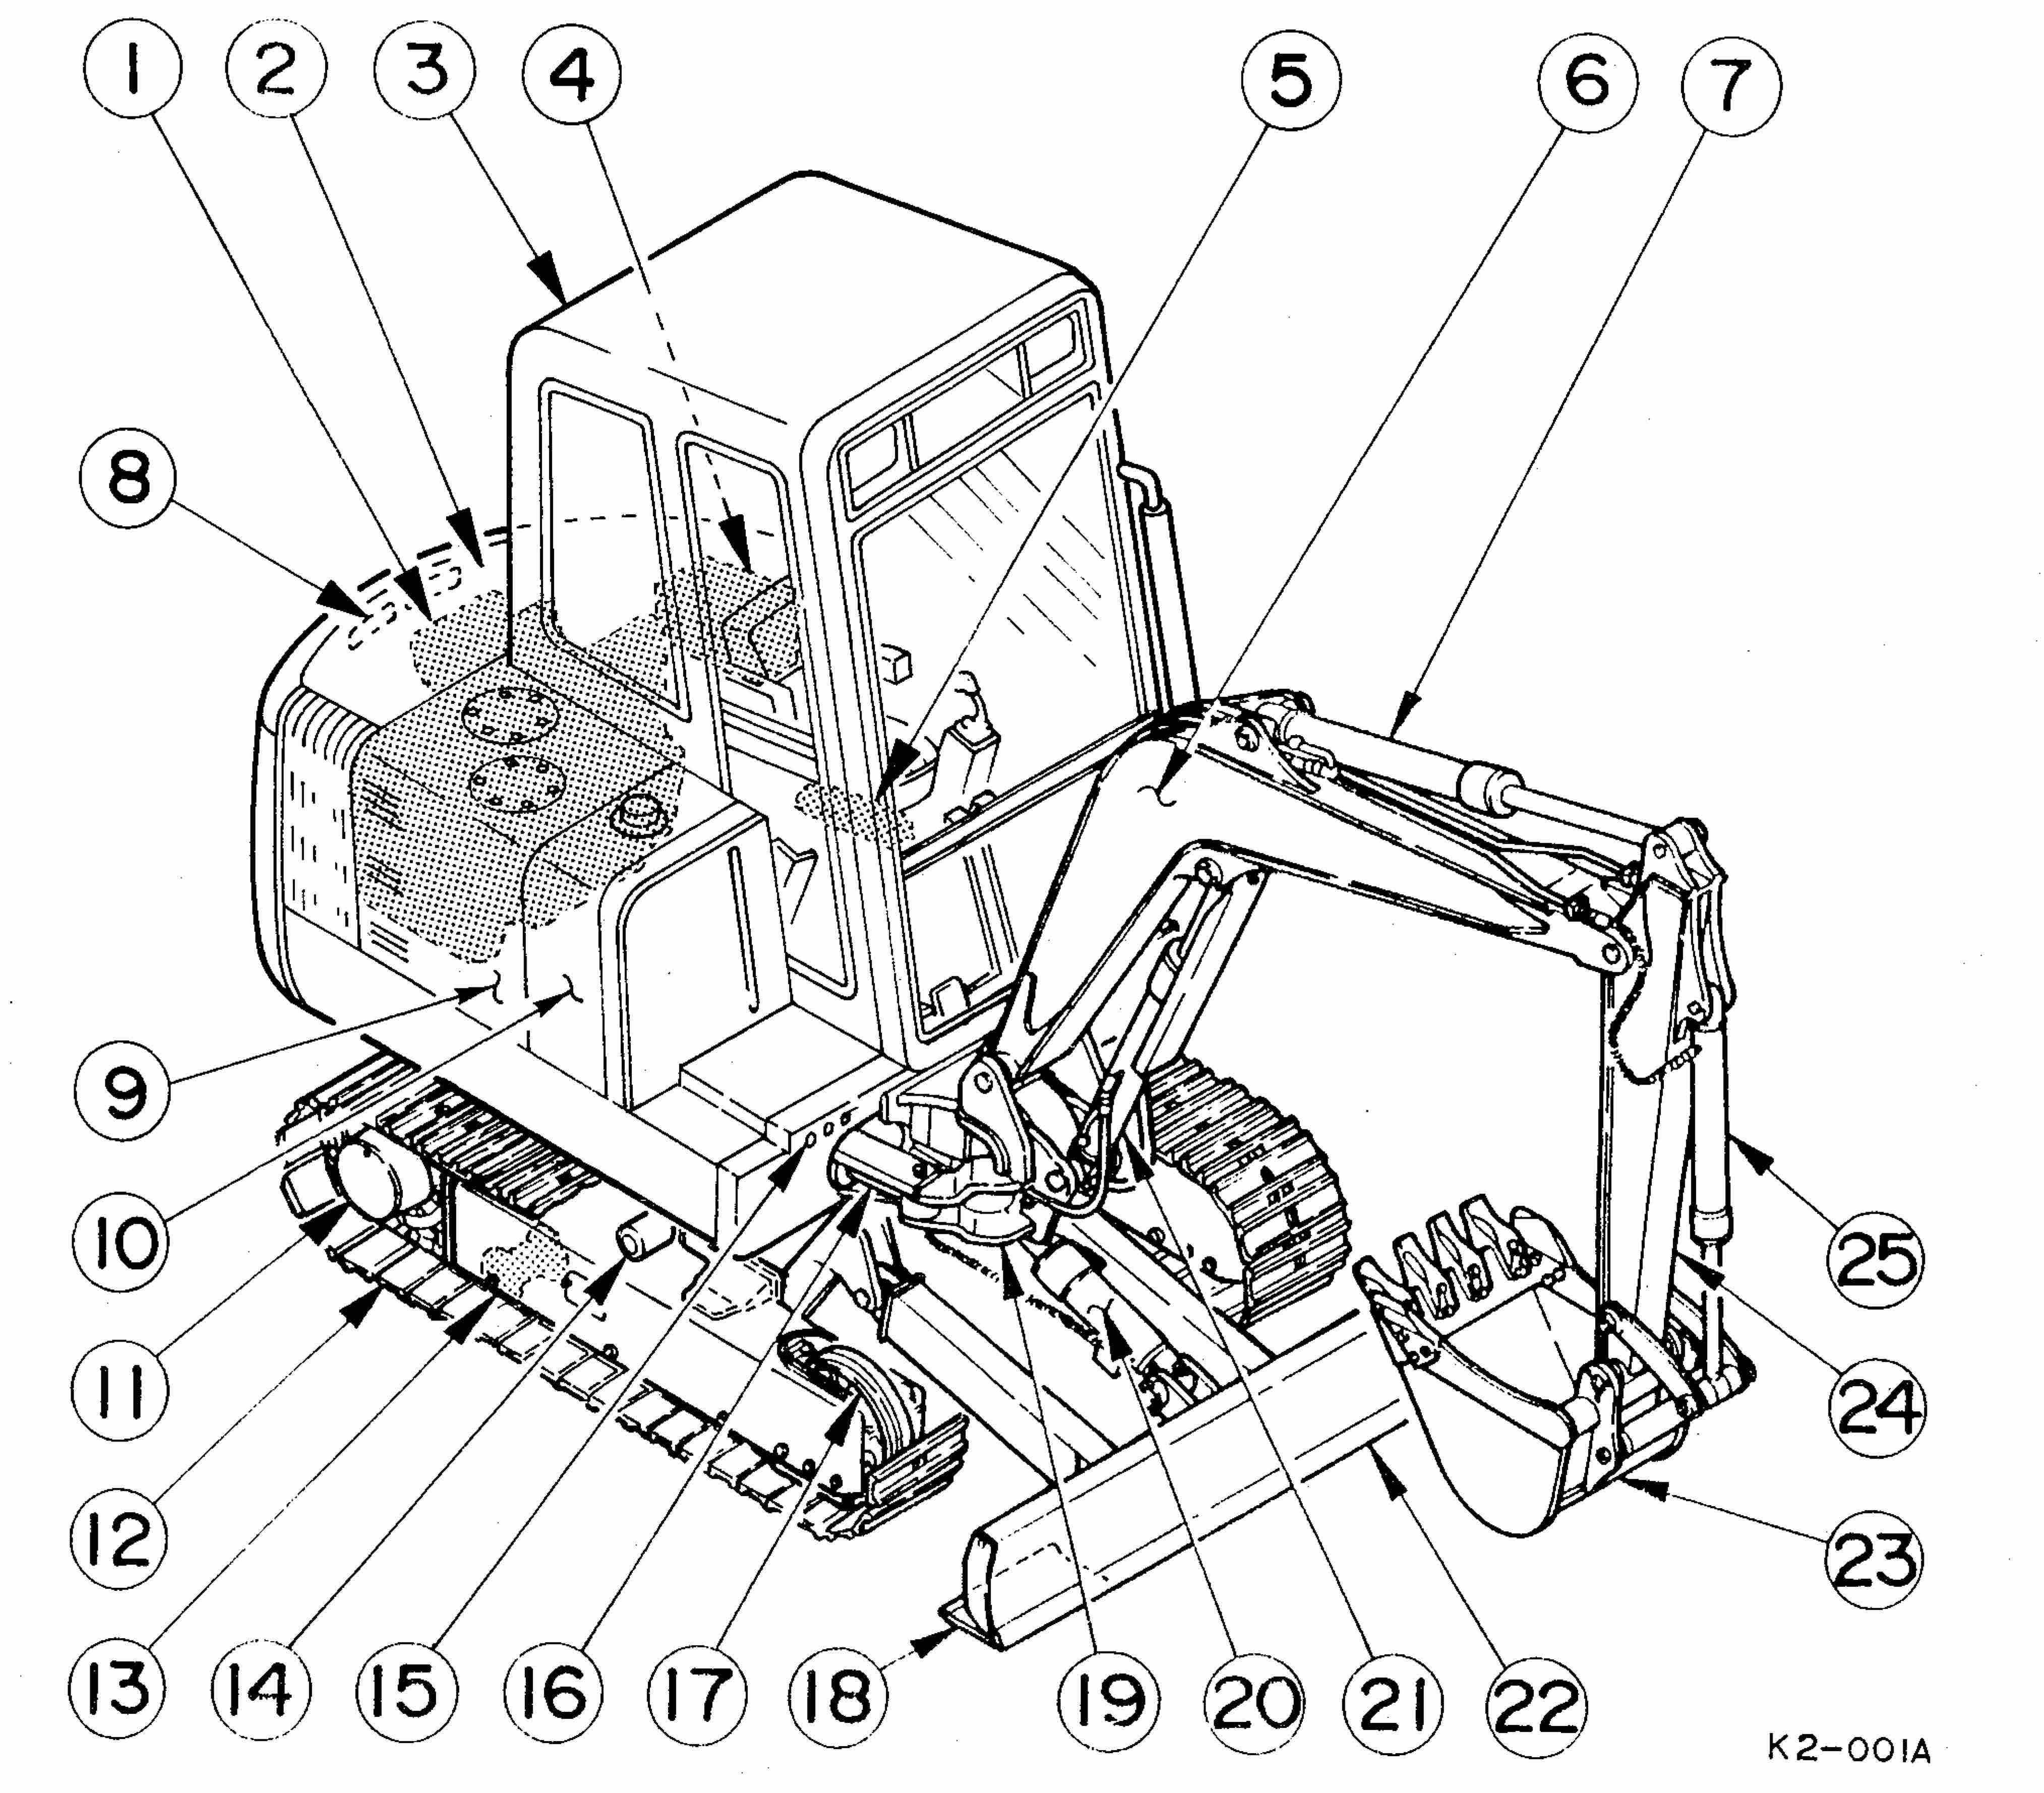 Takeuchi Compact Excavator TB025, TB030, TB035 Repair